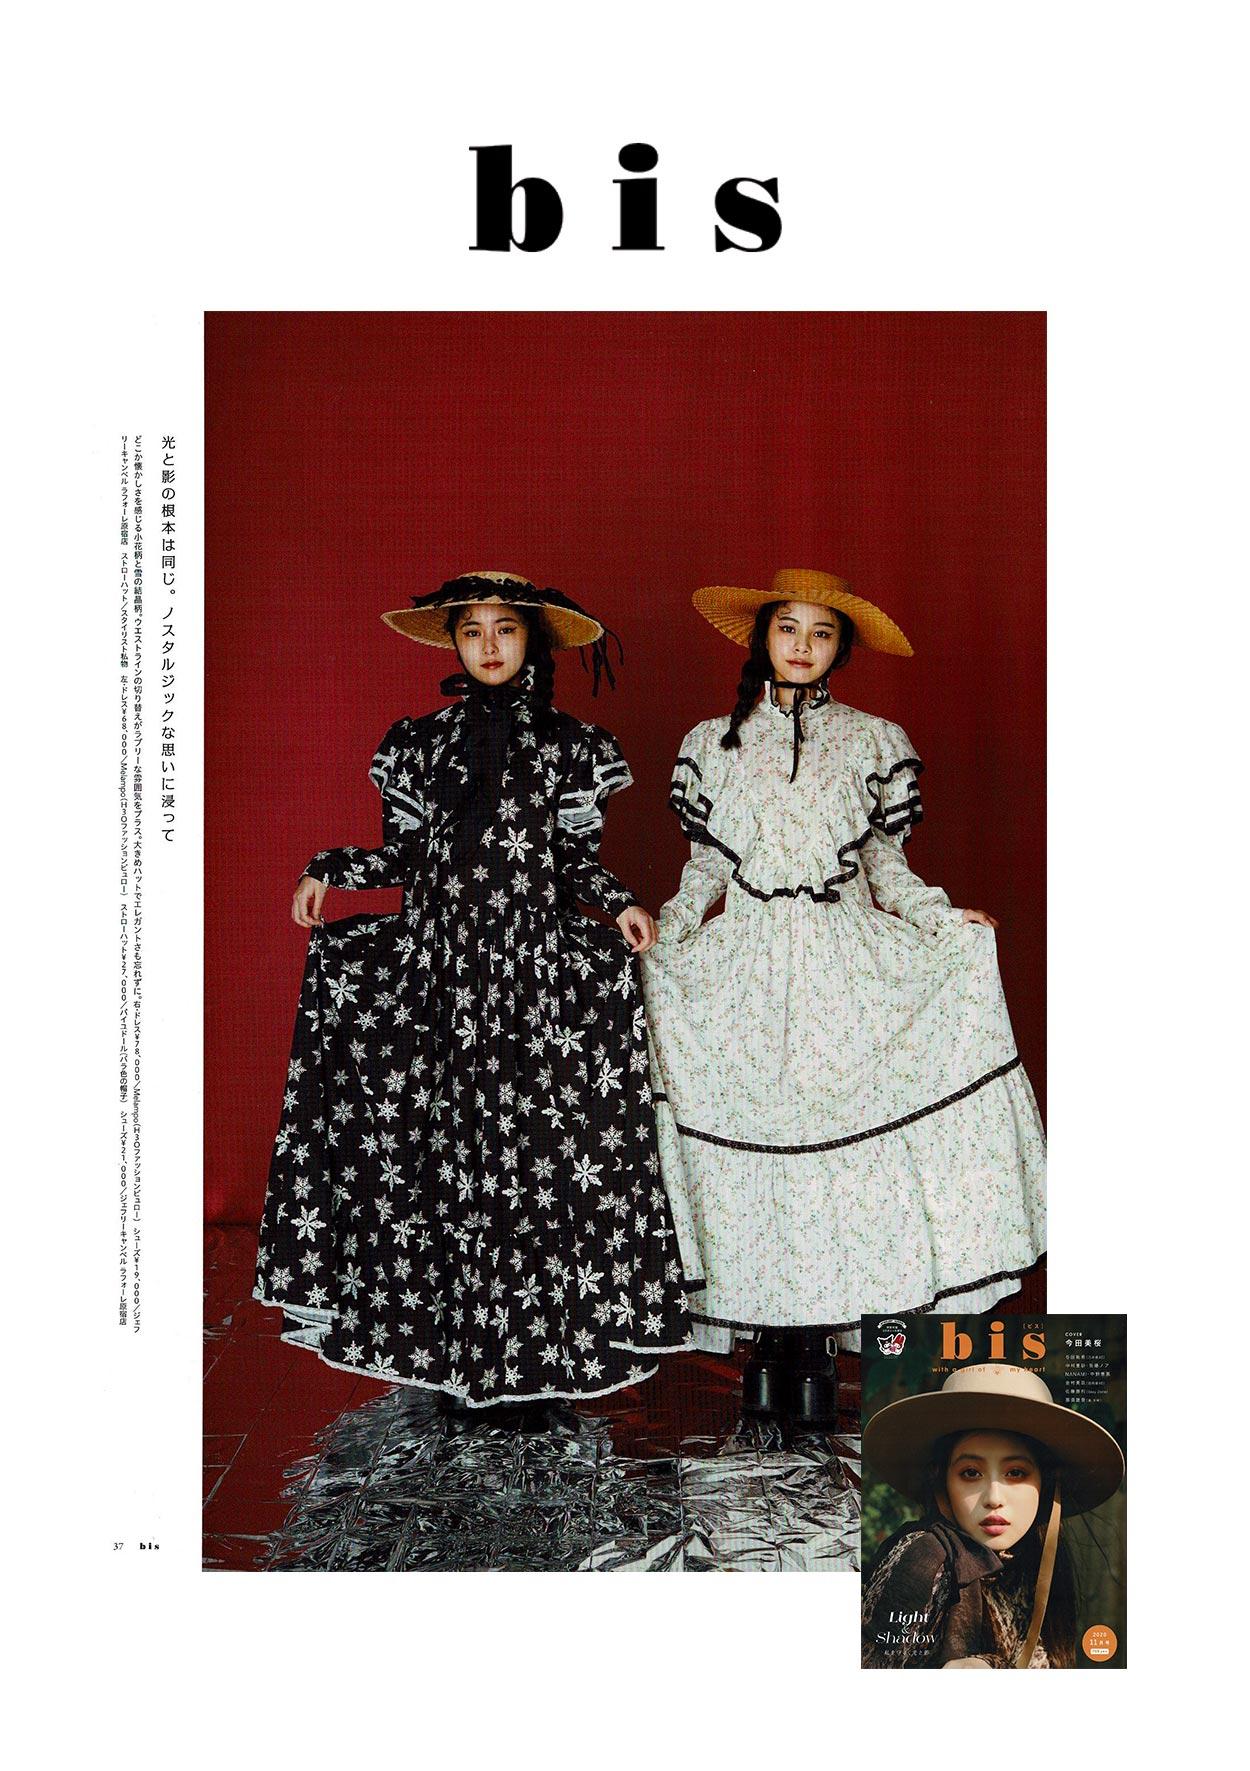 melampo press on bis magazine Japan - photo 1